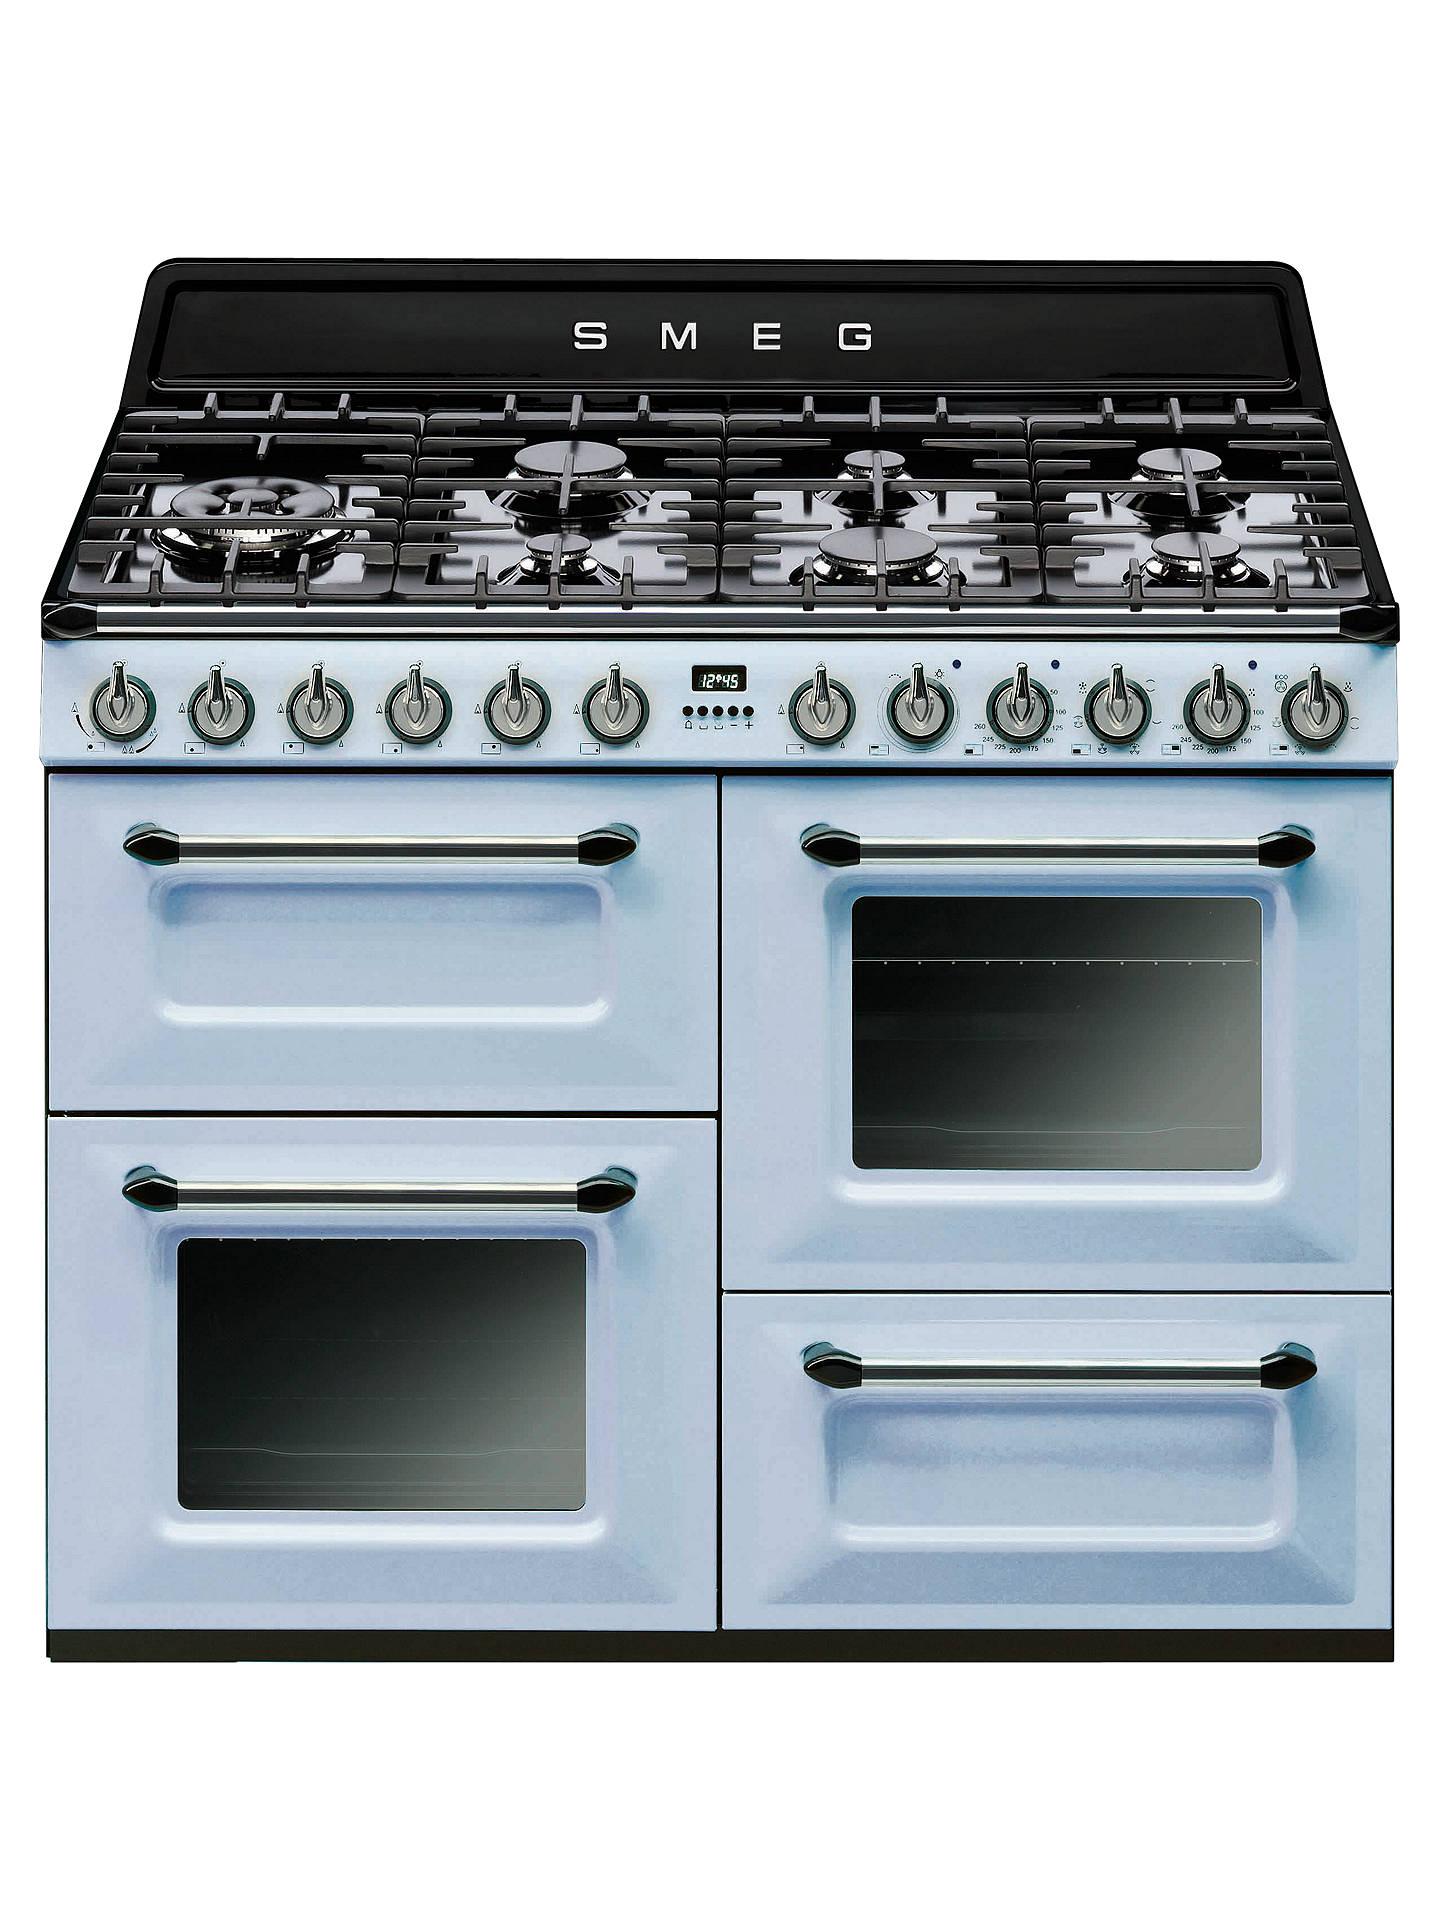 Smeg TR4110 Dual Fuel Range Cooker at John Lewis & Partners